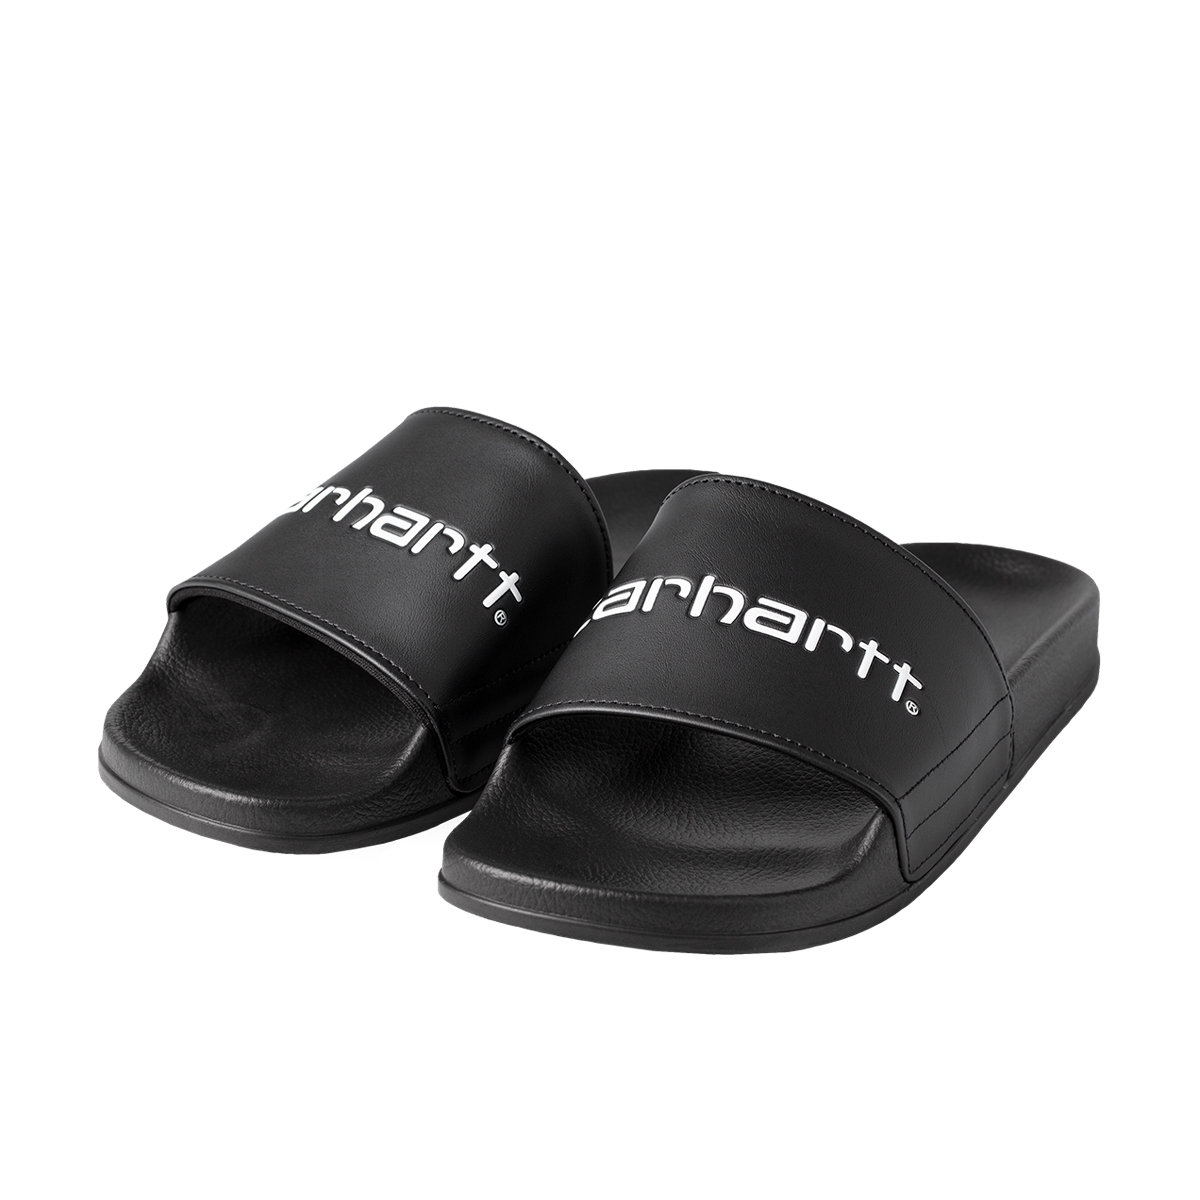 Carhartt WIP Slipper